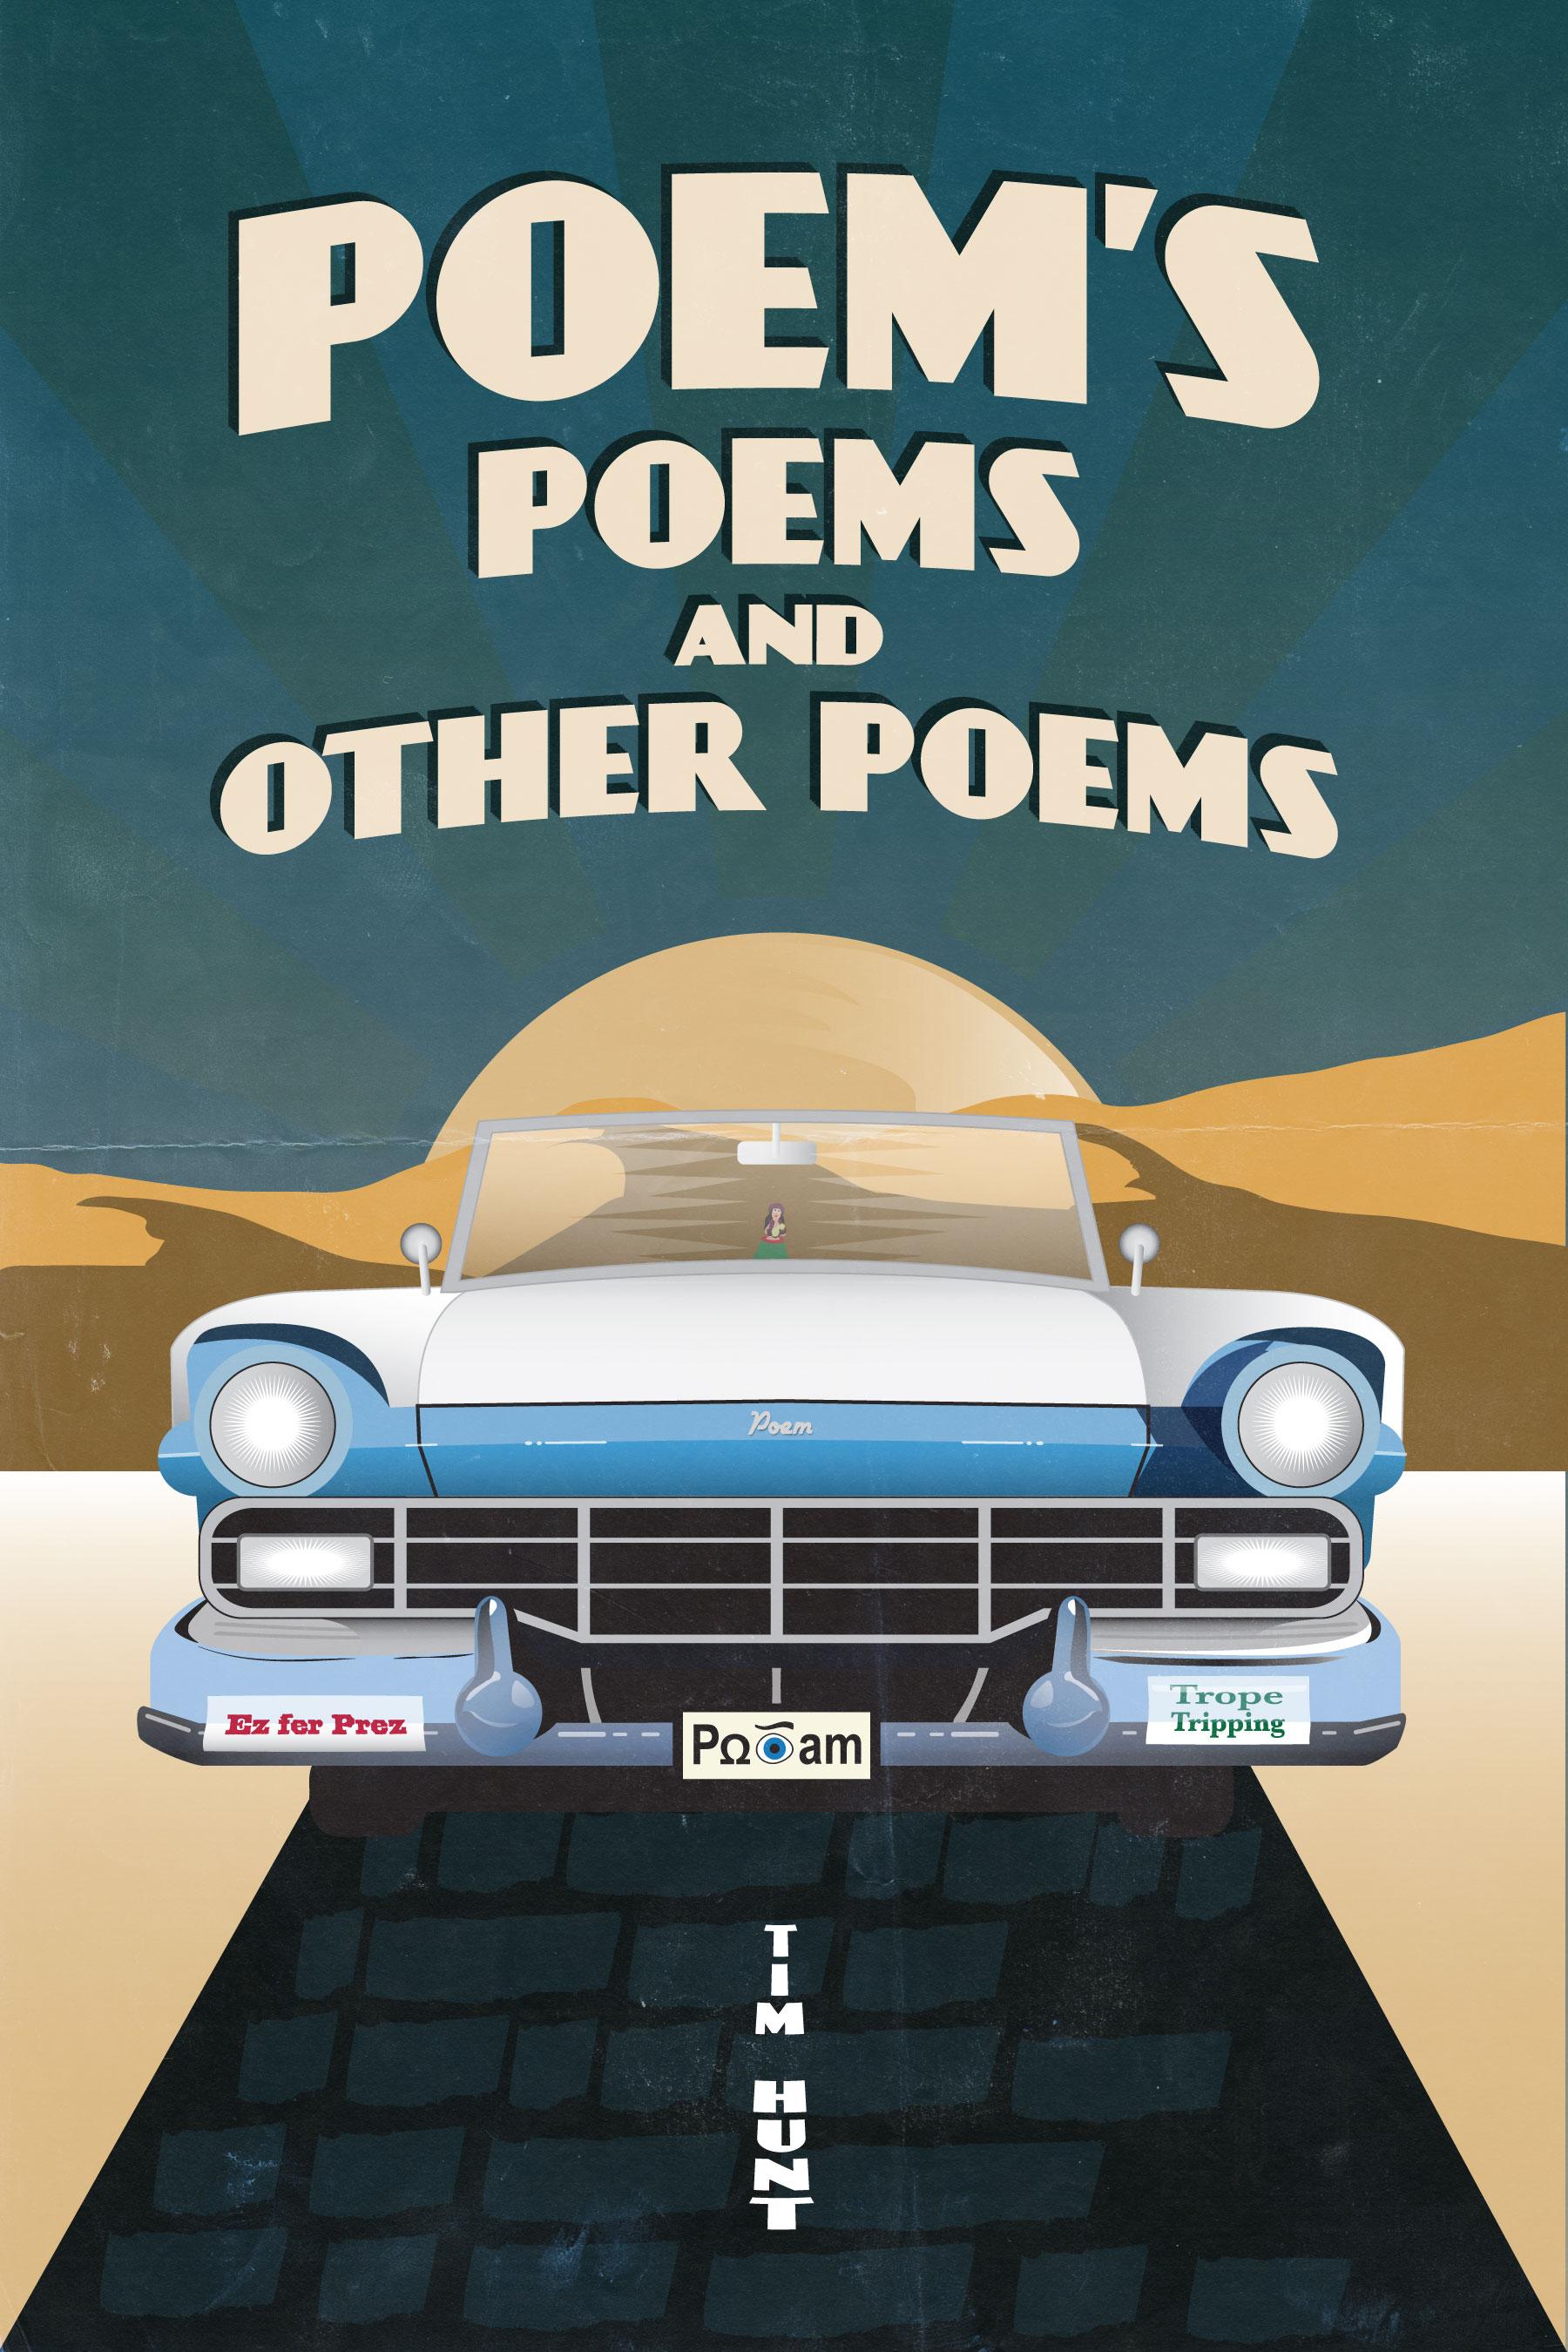 Meta Poems | Examples of Meta Poetry